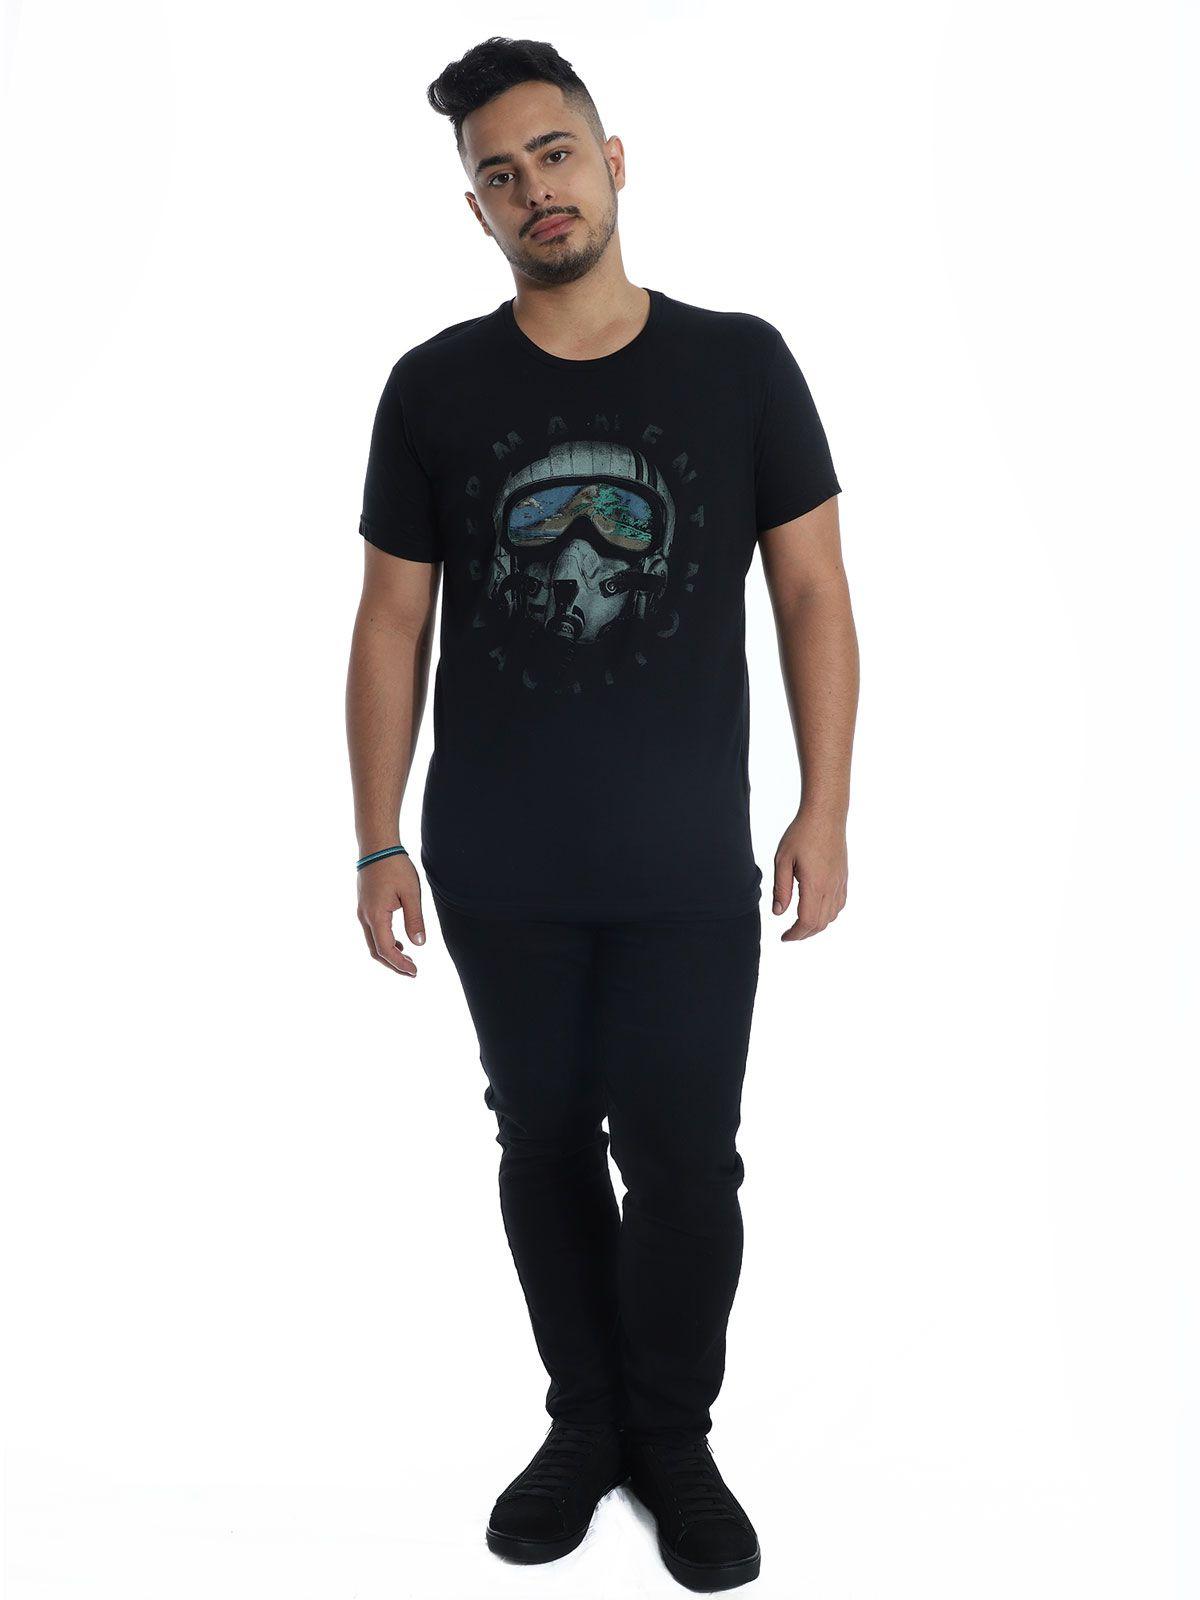 Camiseta Masculina Slim Fit Anistia Vacation Preto